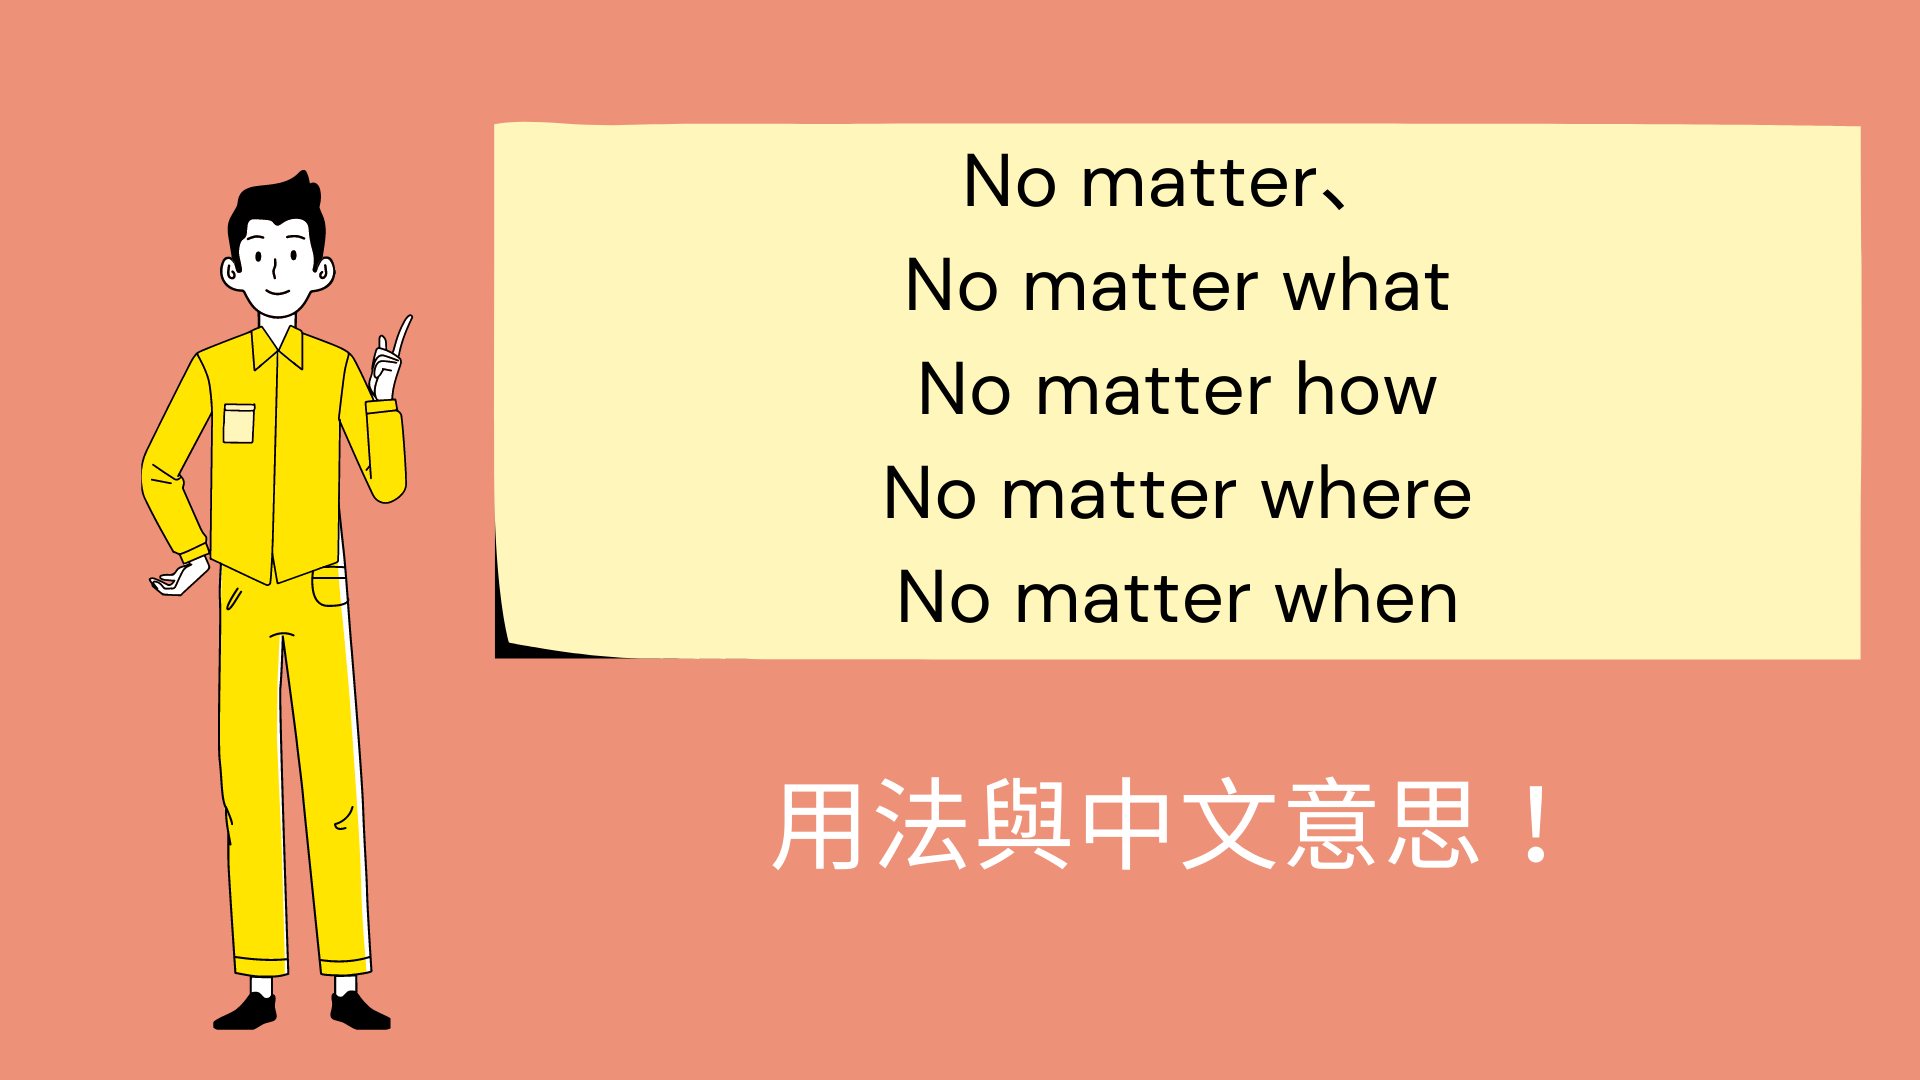 英文 No matter、No matter what/ how/ where/ when 用法與中文意思!一次搞懂